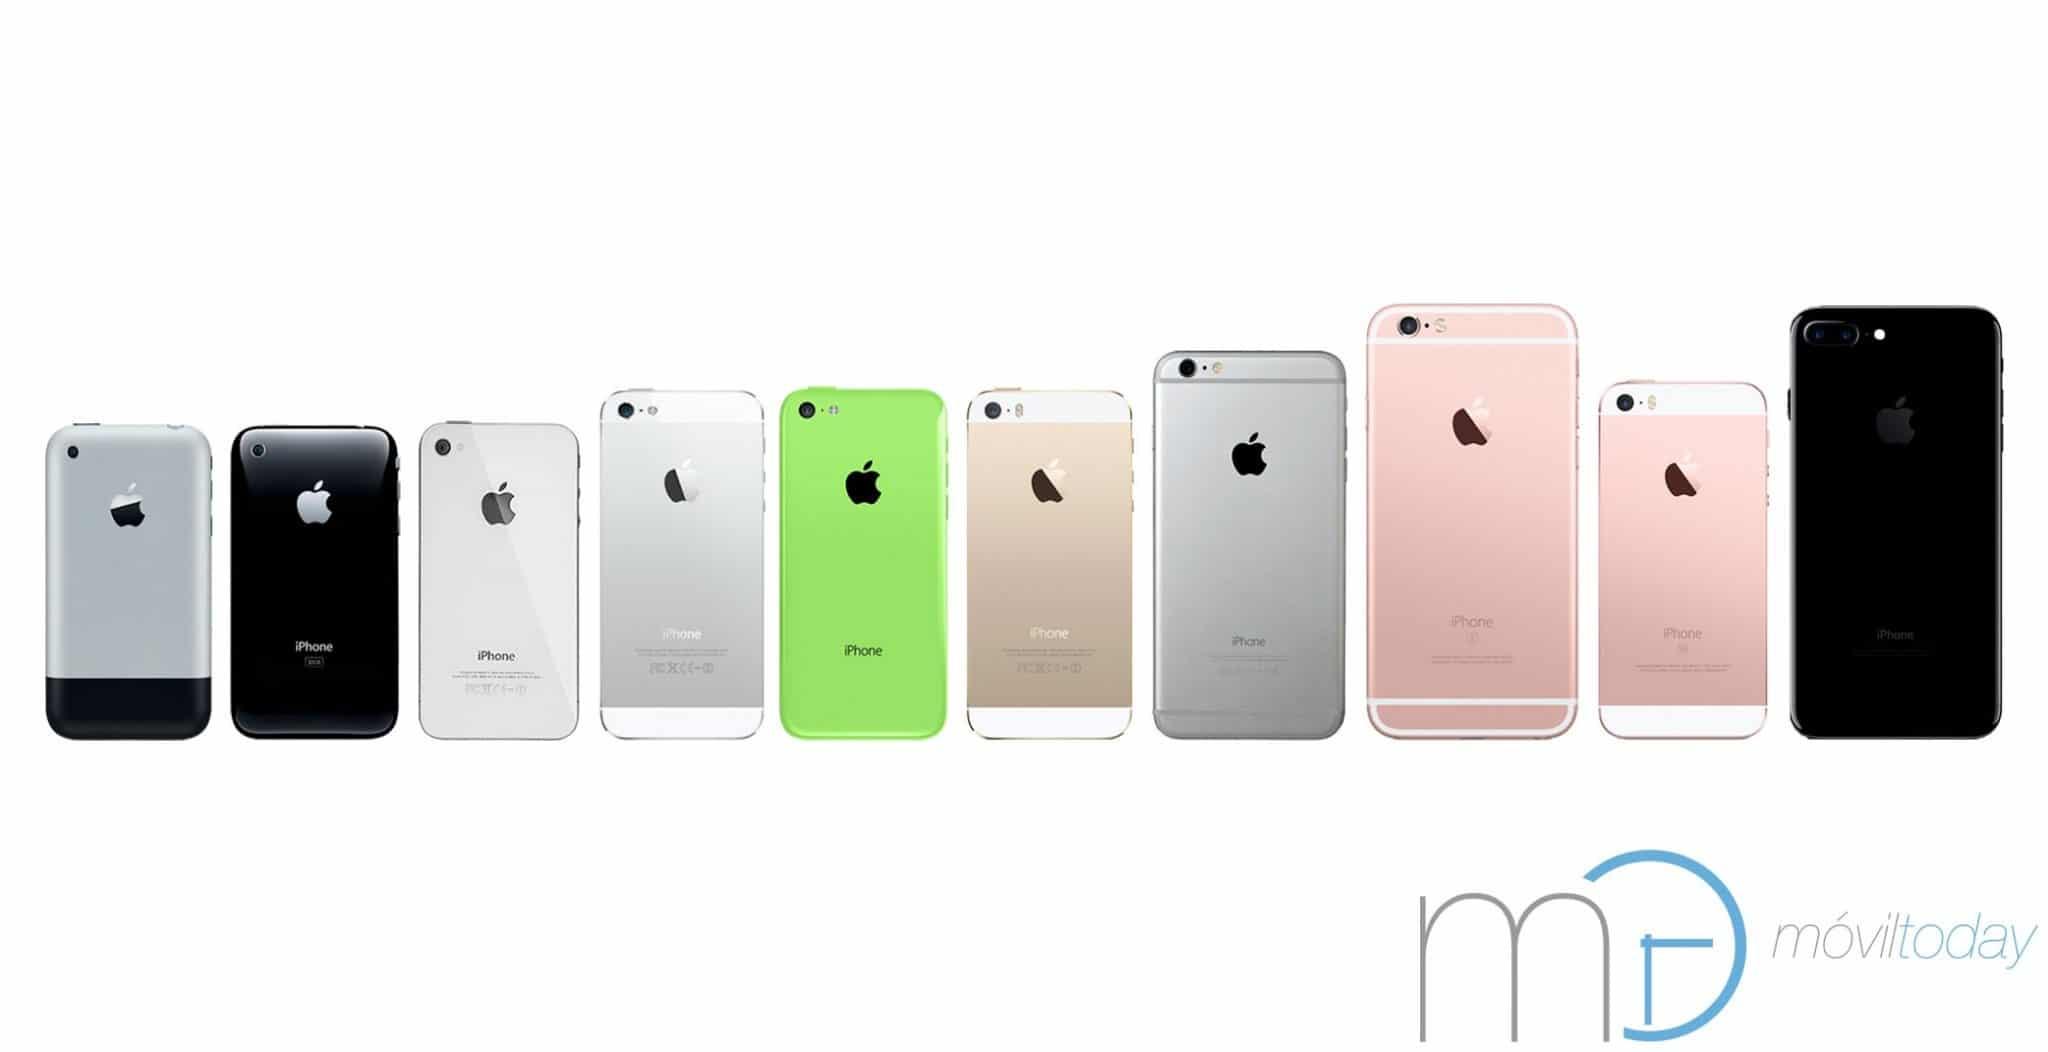 Evolución del iPhone, del iPhone (2007) al iPhone 7 (2016)